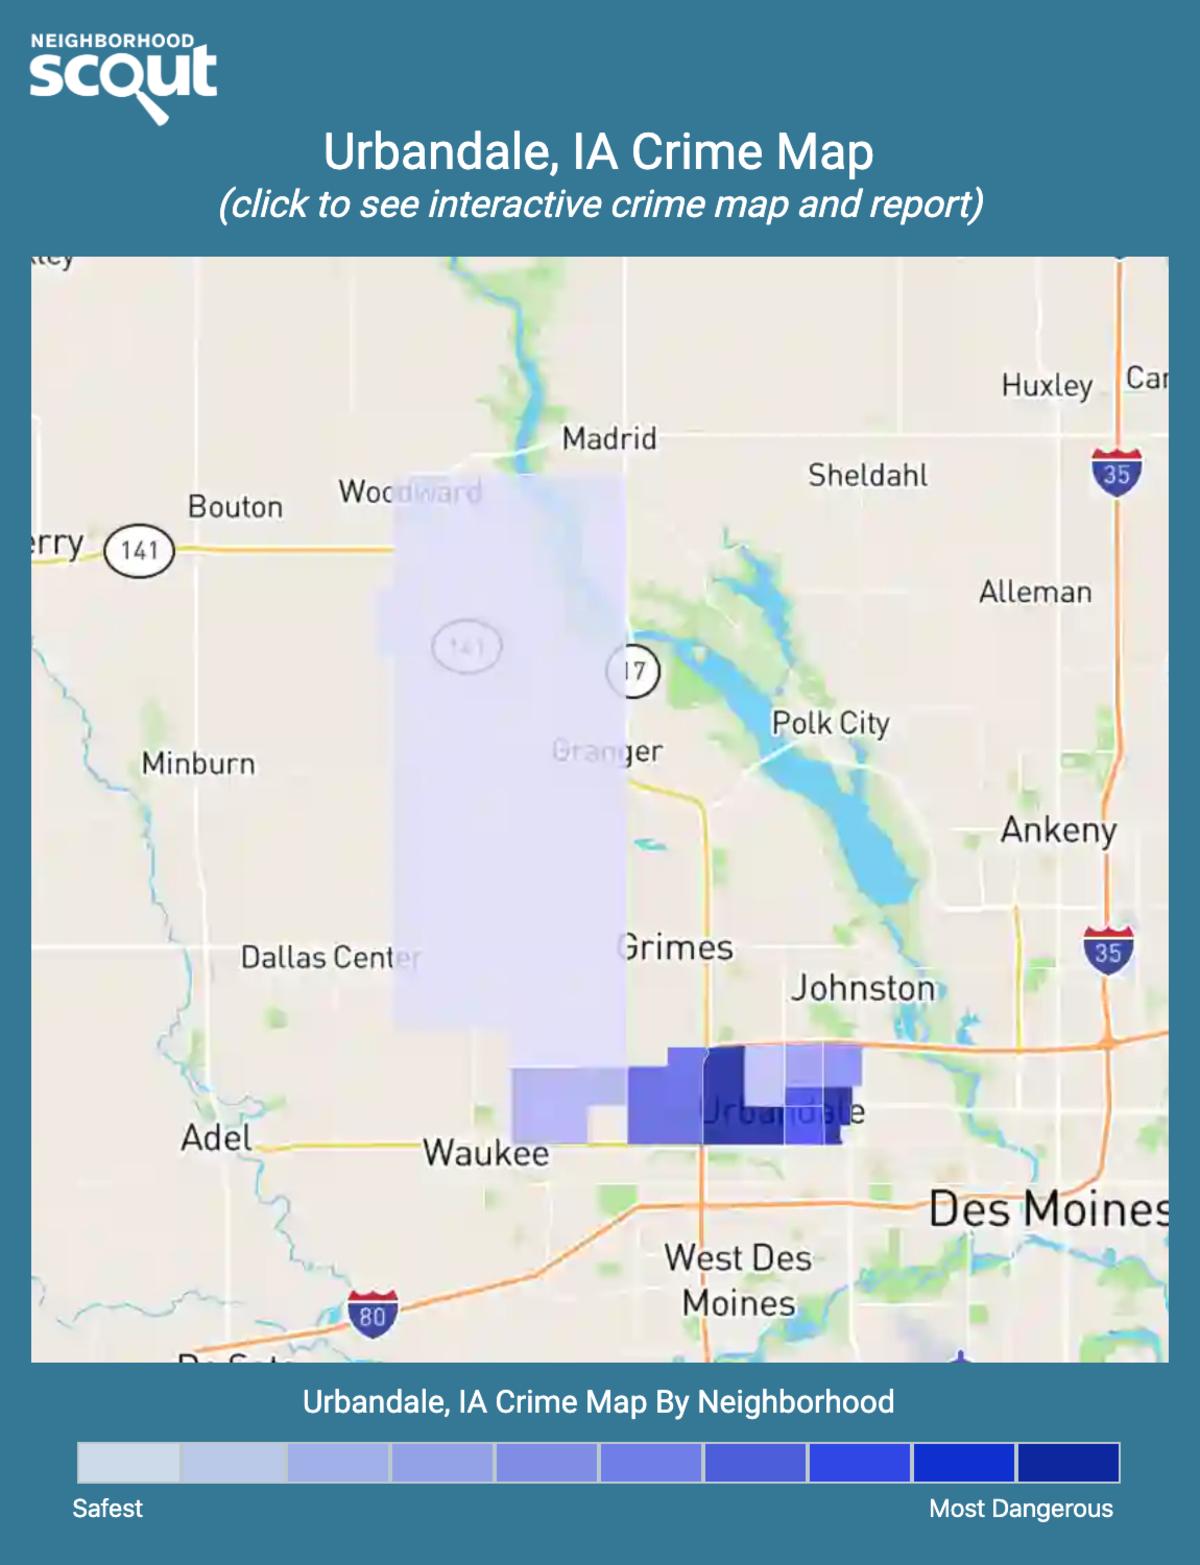 Urbandale, Iowa crime map